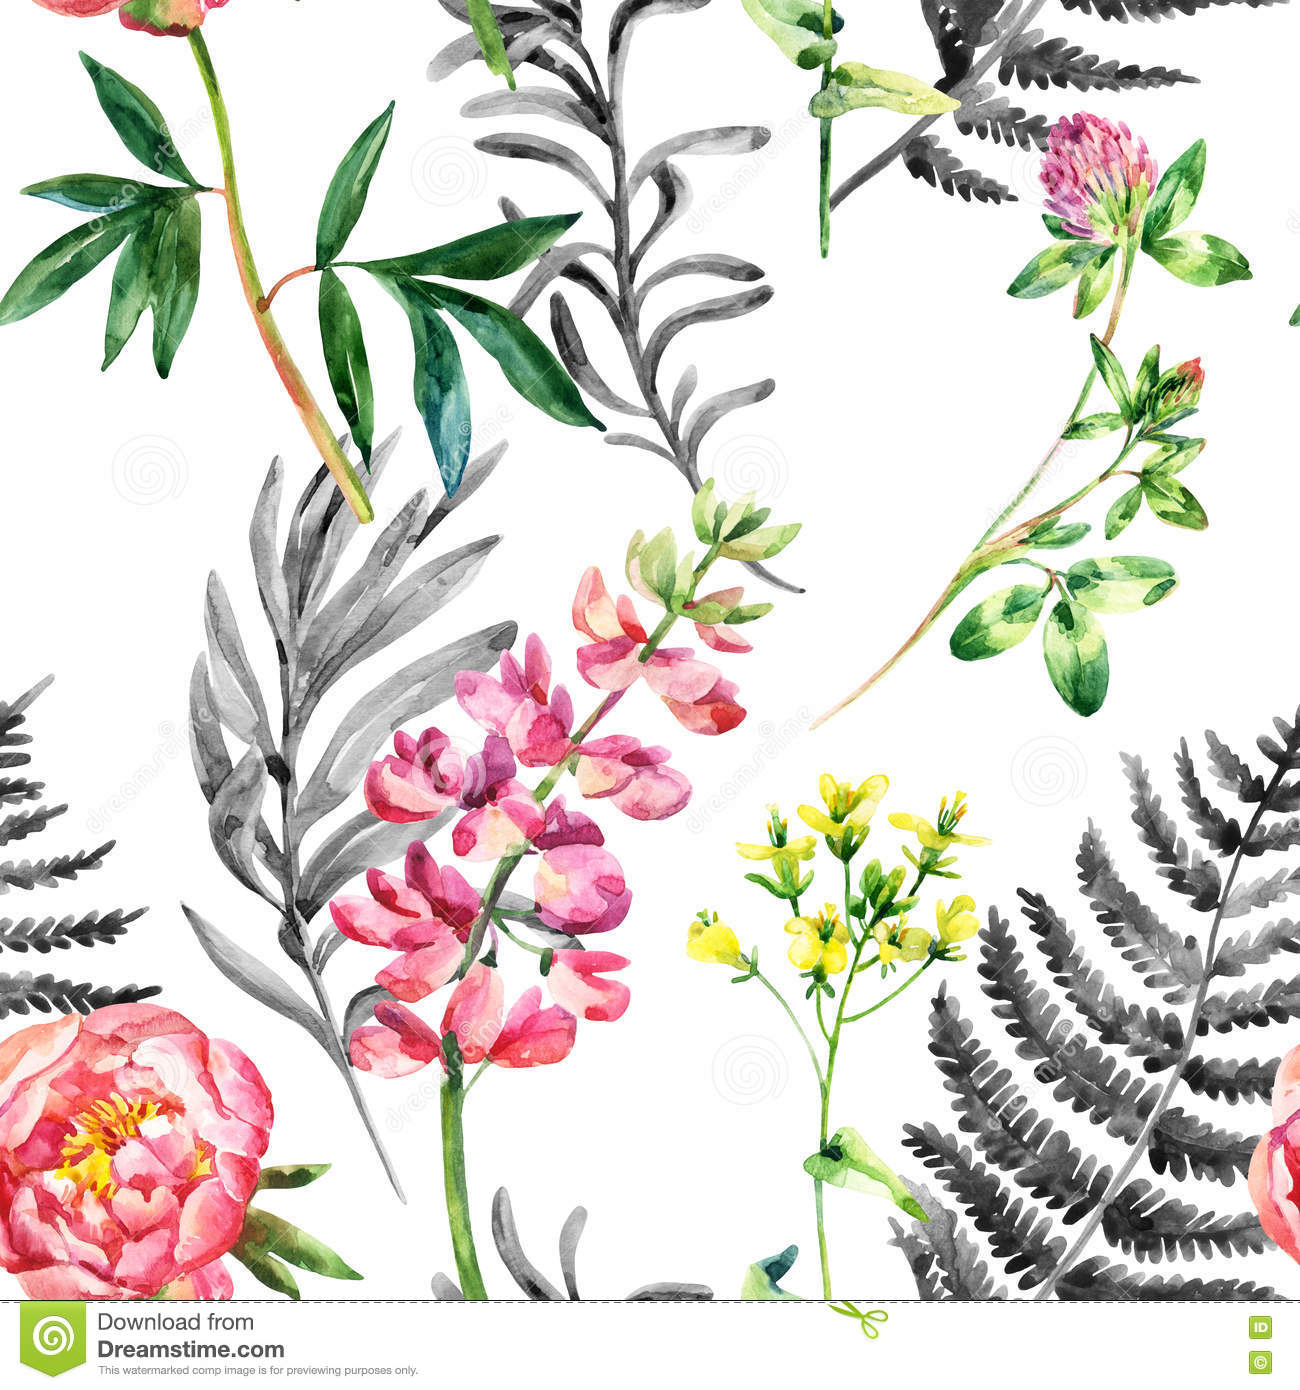 Watercolor Wild Garden Flowers Seamless Pattern. Stock.